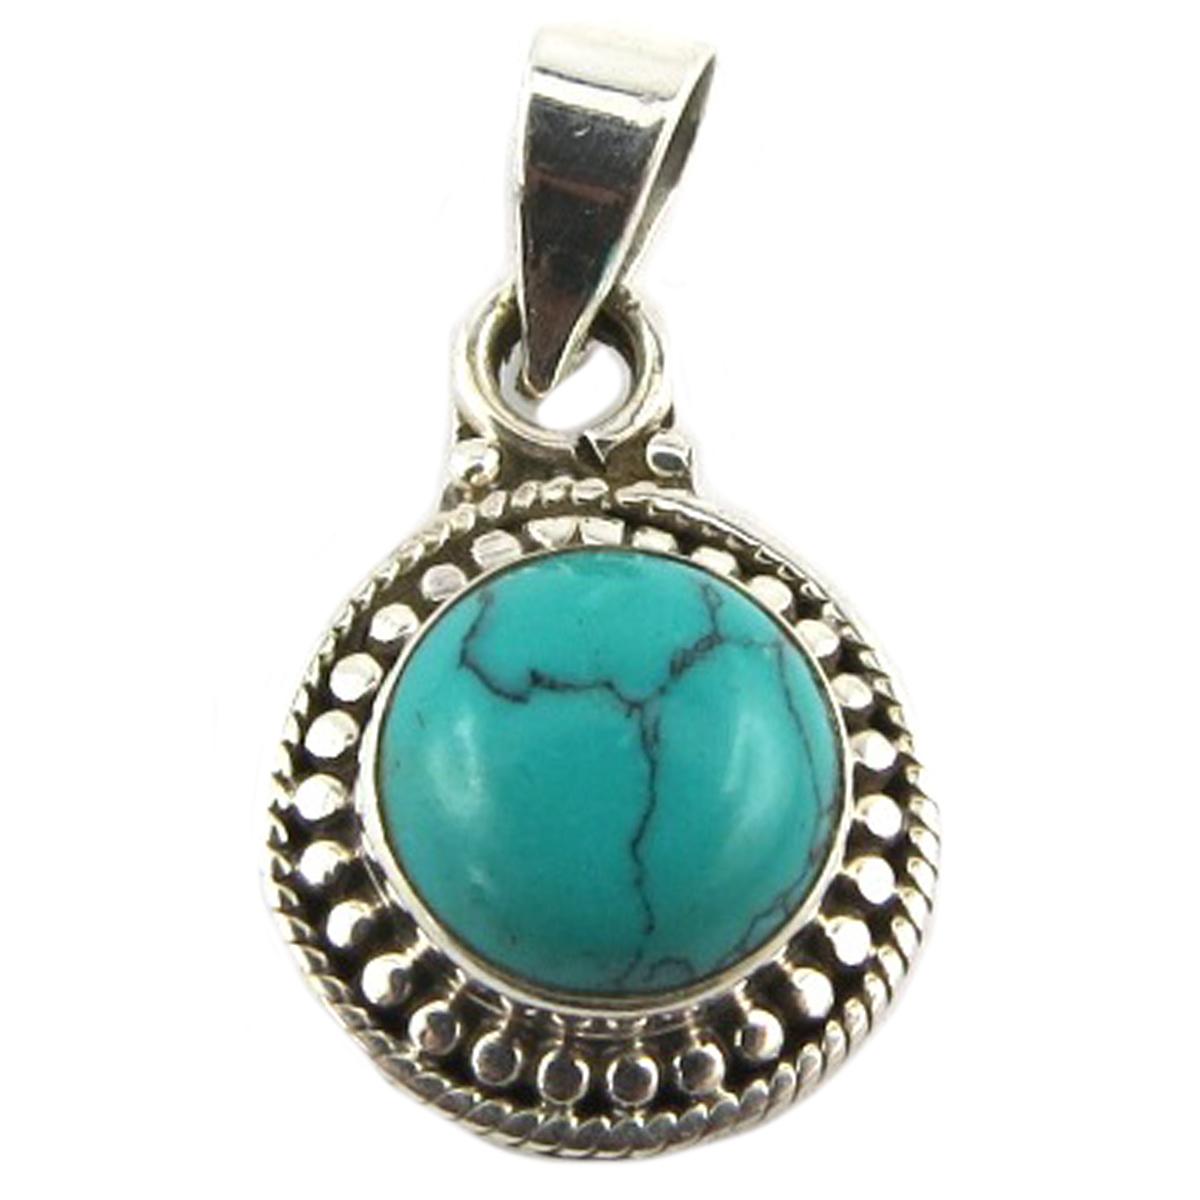 Pendentif Argent artisanal \'Heaven\' turquoise - 12 mm - [Q9868]